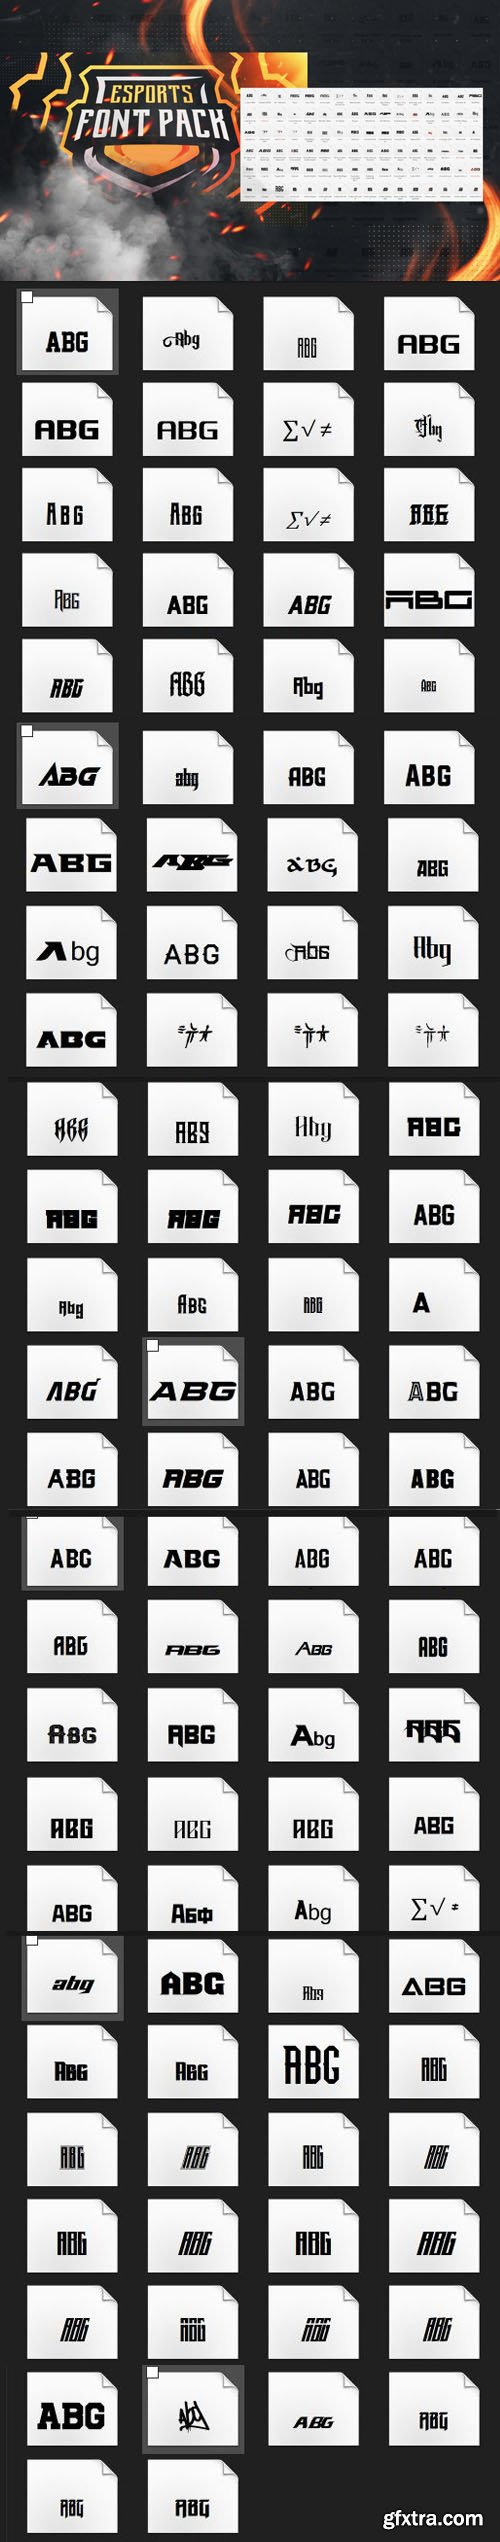 Esports Font Pack - 75 Fonts